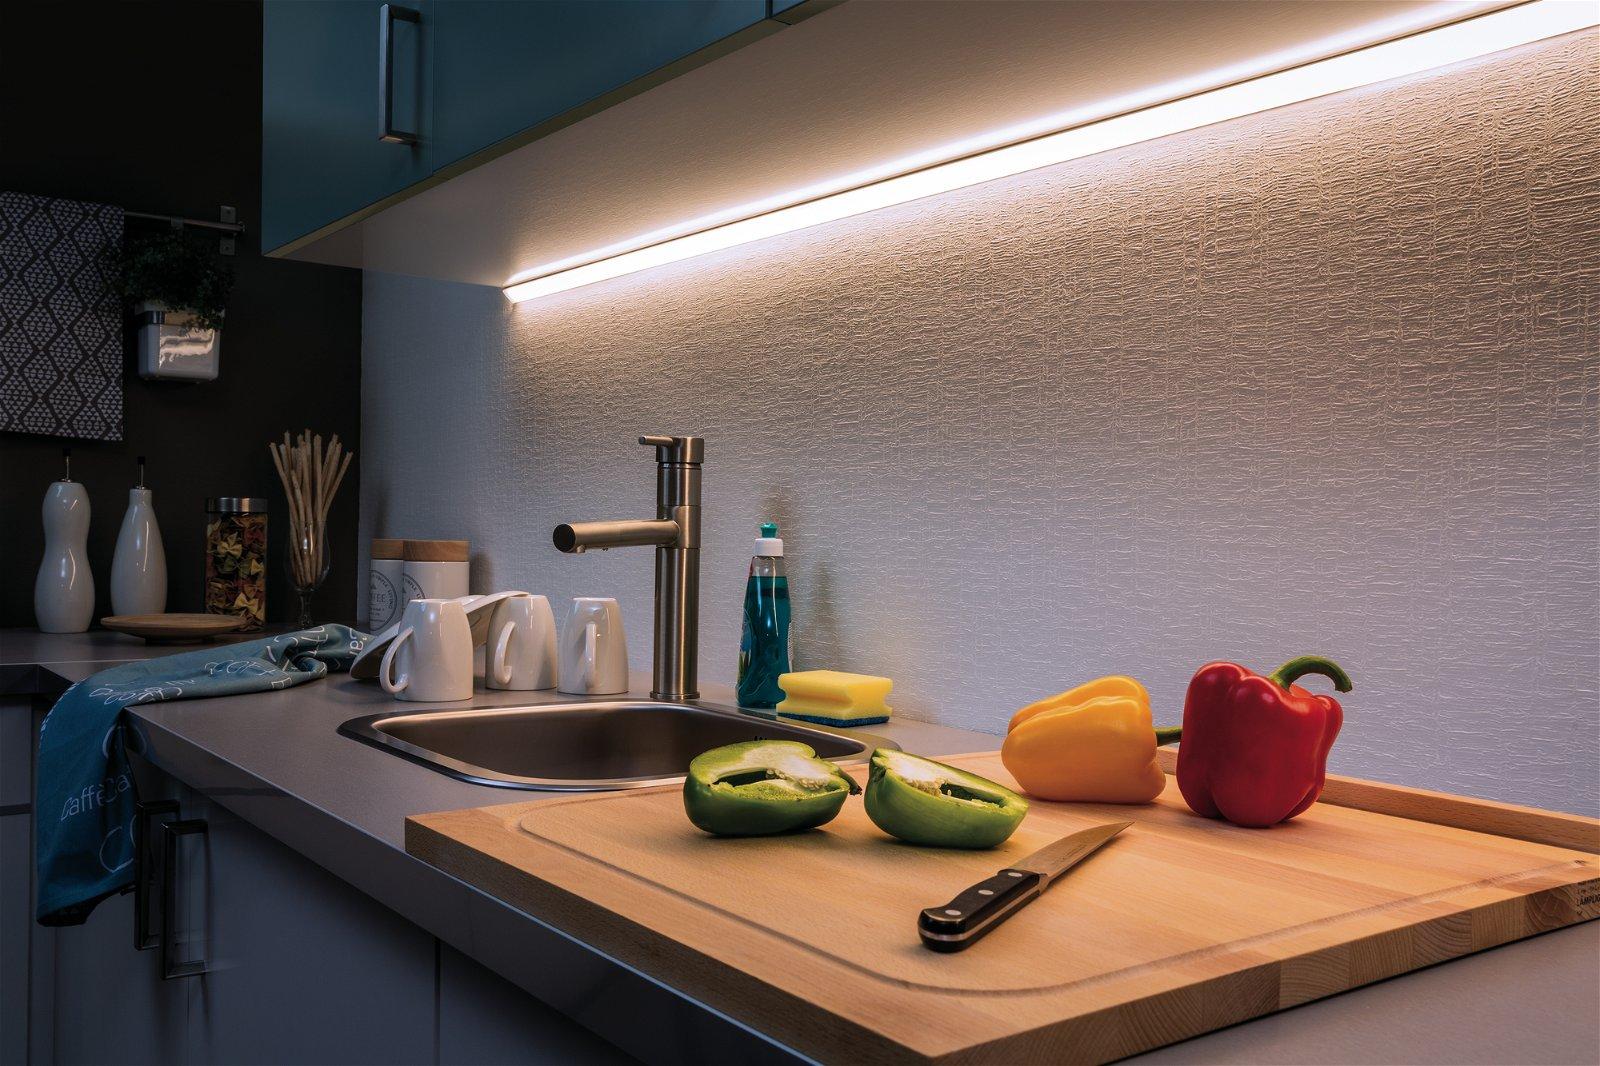 MaxLED 500 LED Strip Daglichtwit 3m 18W 1650lm 6500K 36VA